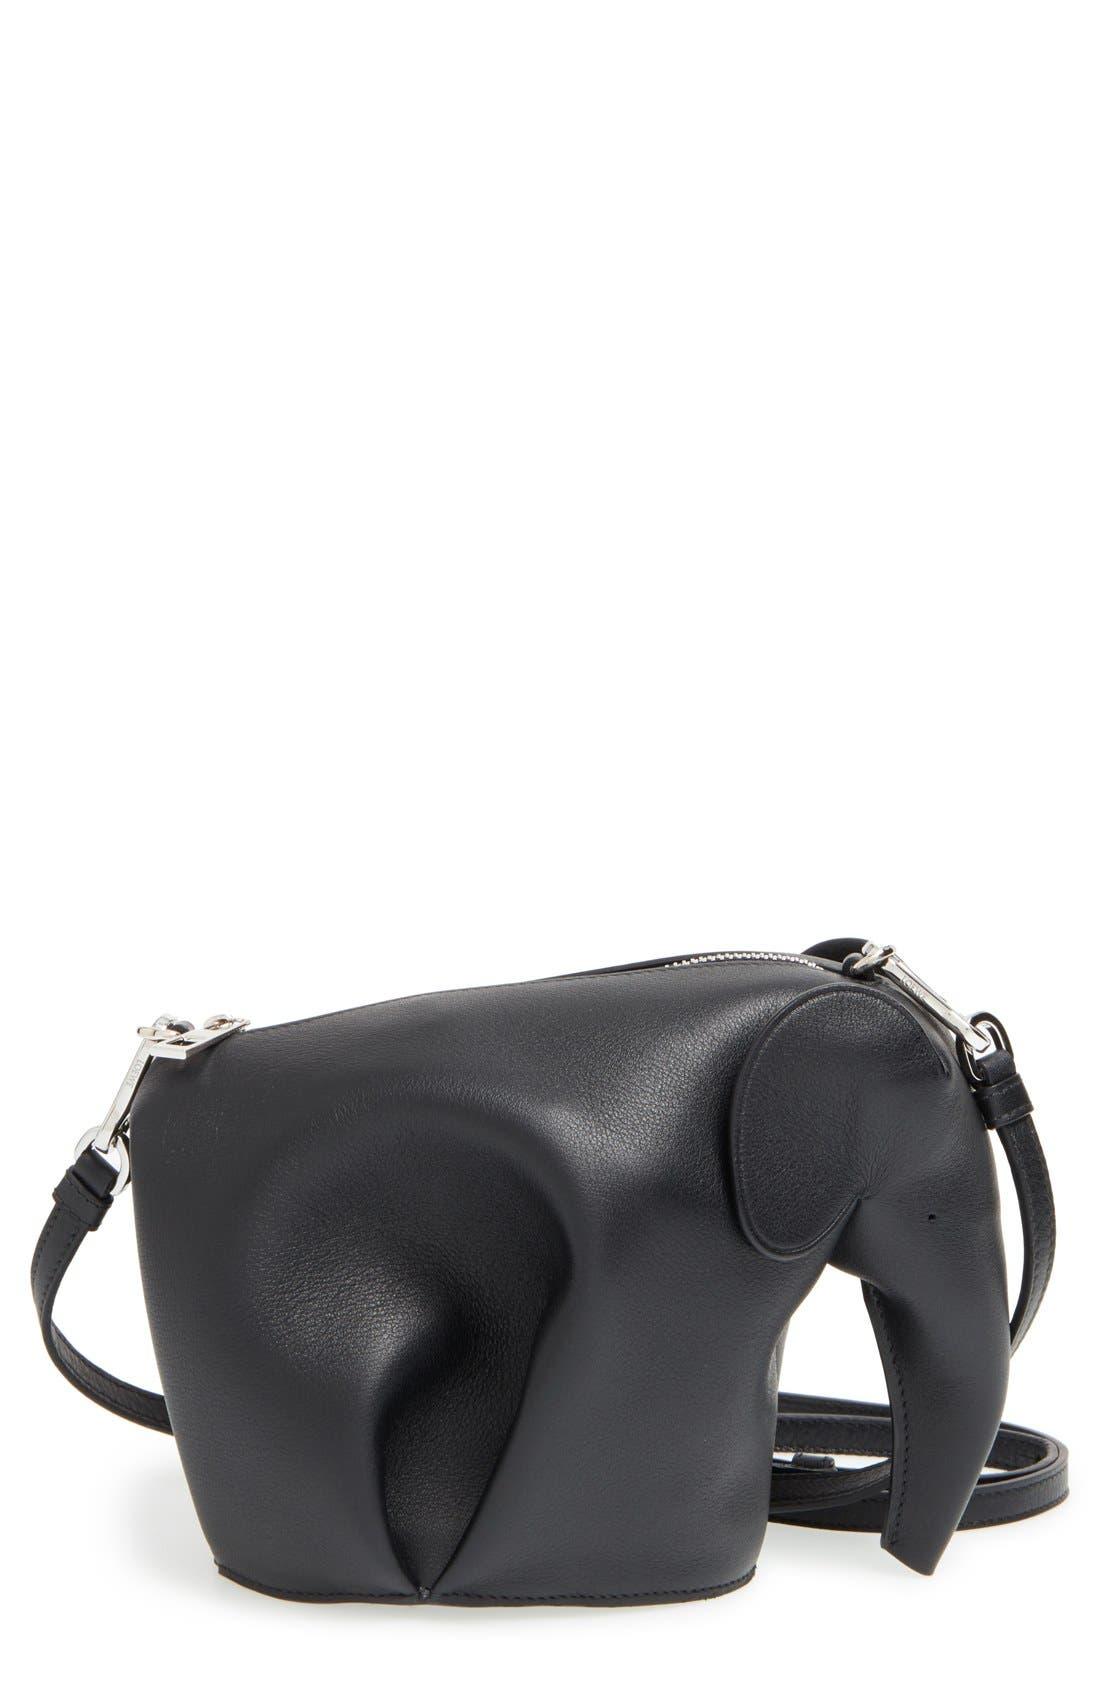 LOEWE 'Mini Elephant' Crossbody Bag, Main, color, 001